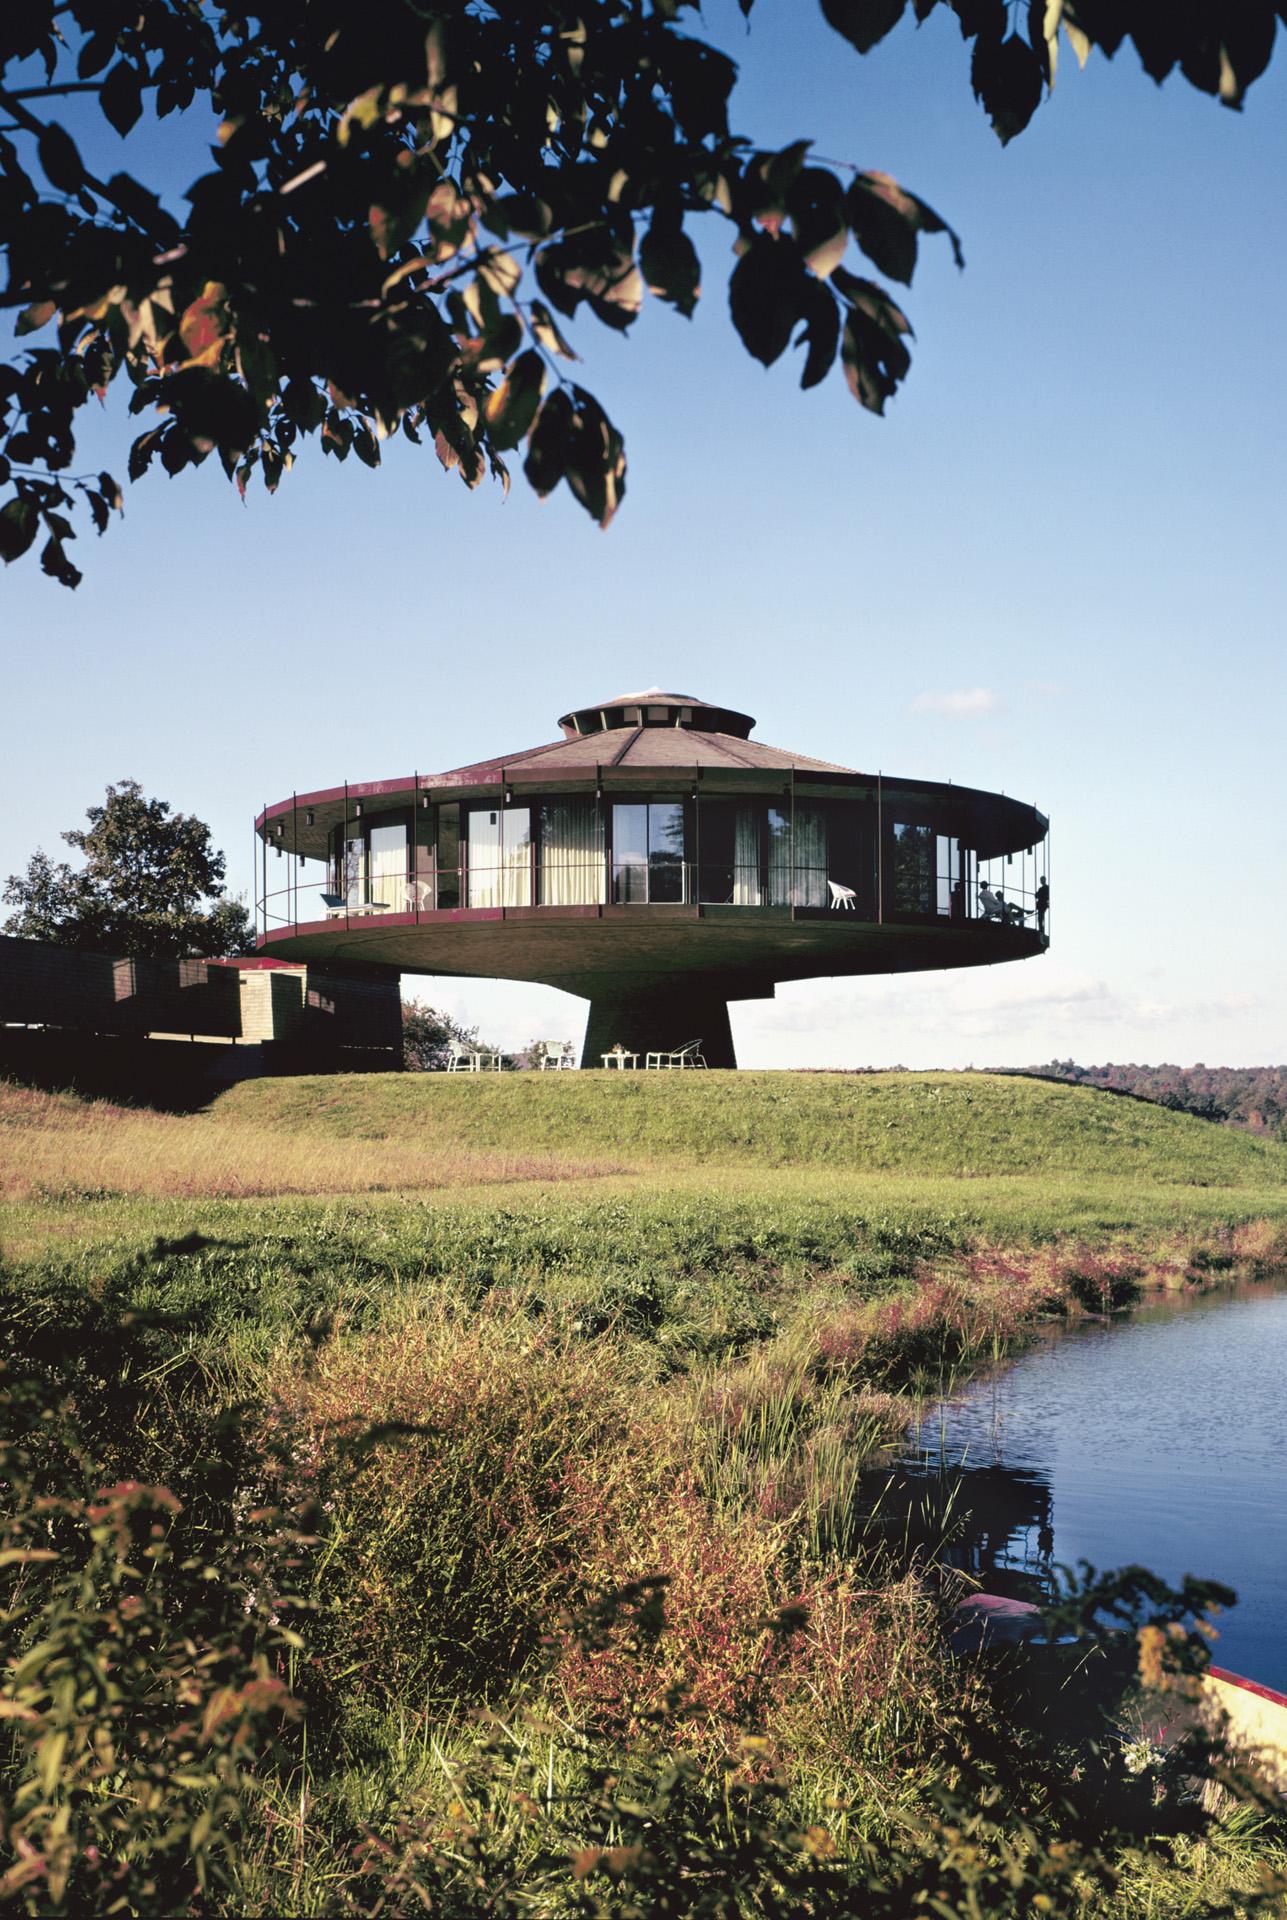 Richard Foster House aka Spaceship House, Location: Wilton CT, Architect: Richard Foster